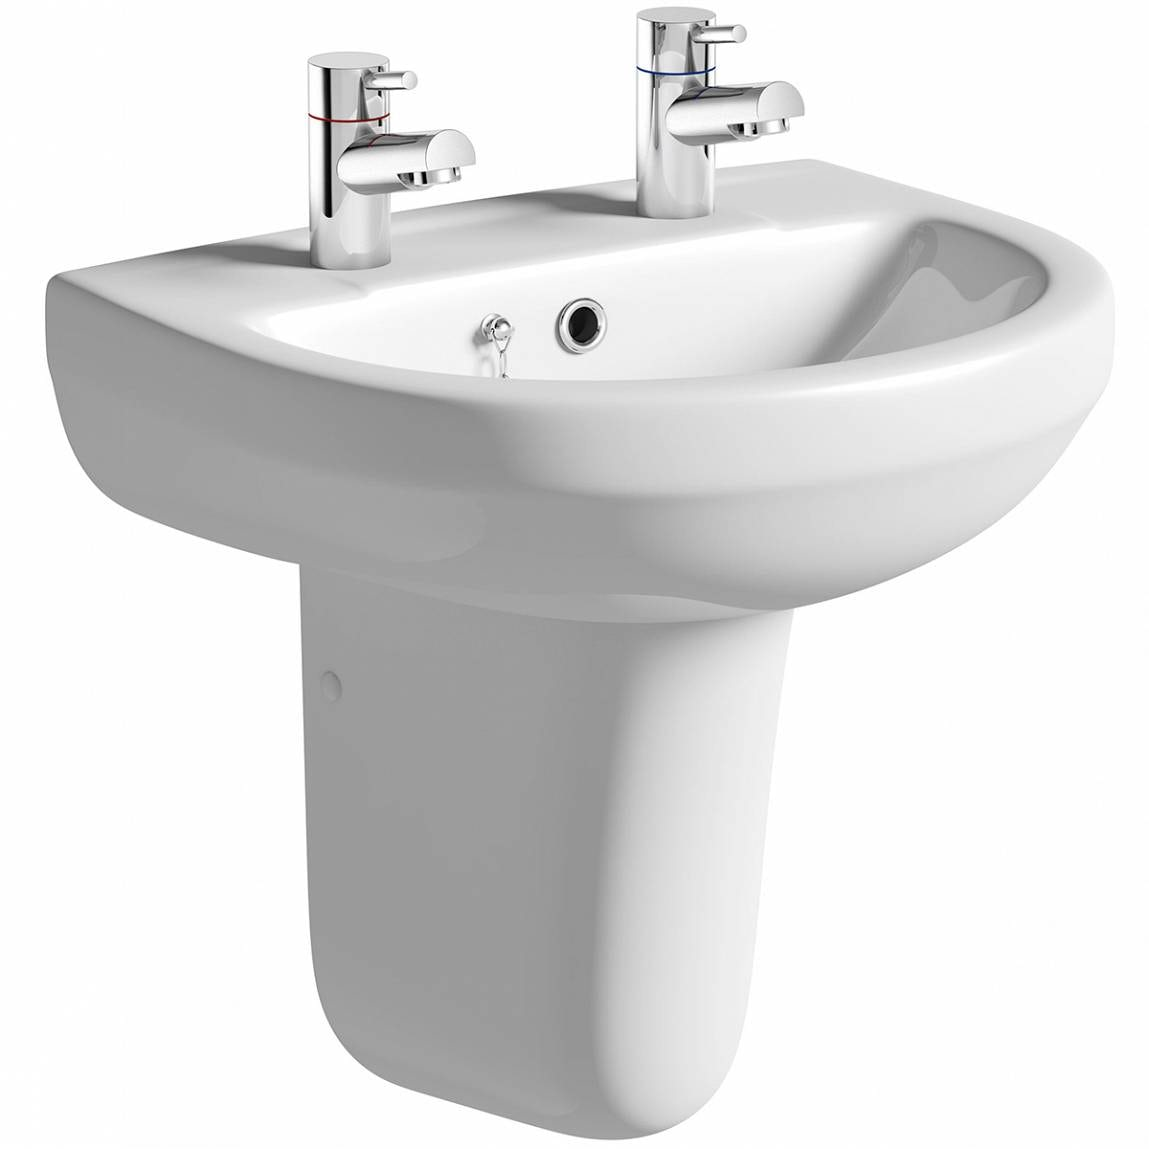 Orchard Eden 2 tap hole semi pedestal basin 550mm